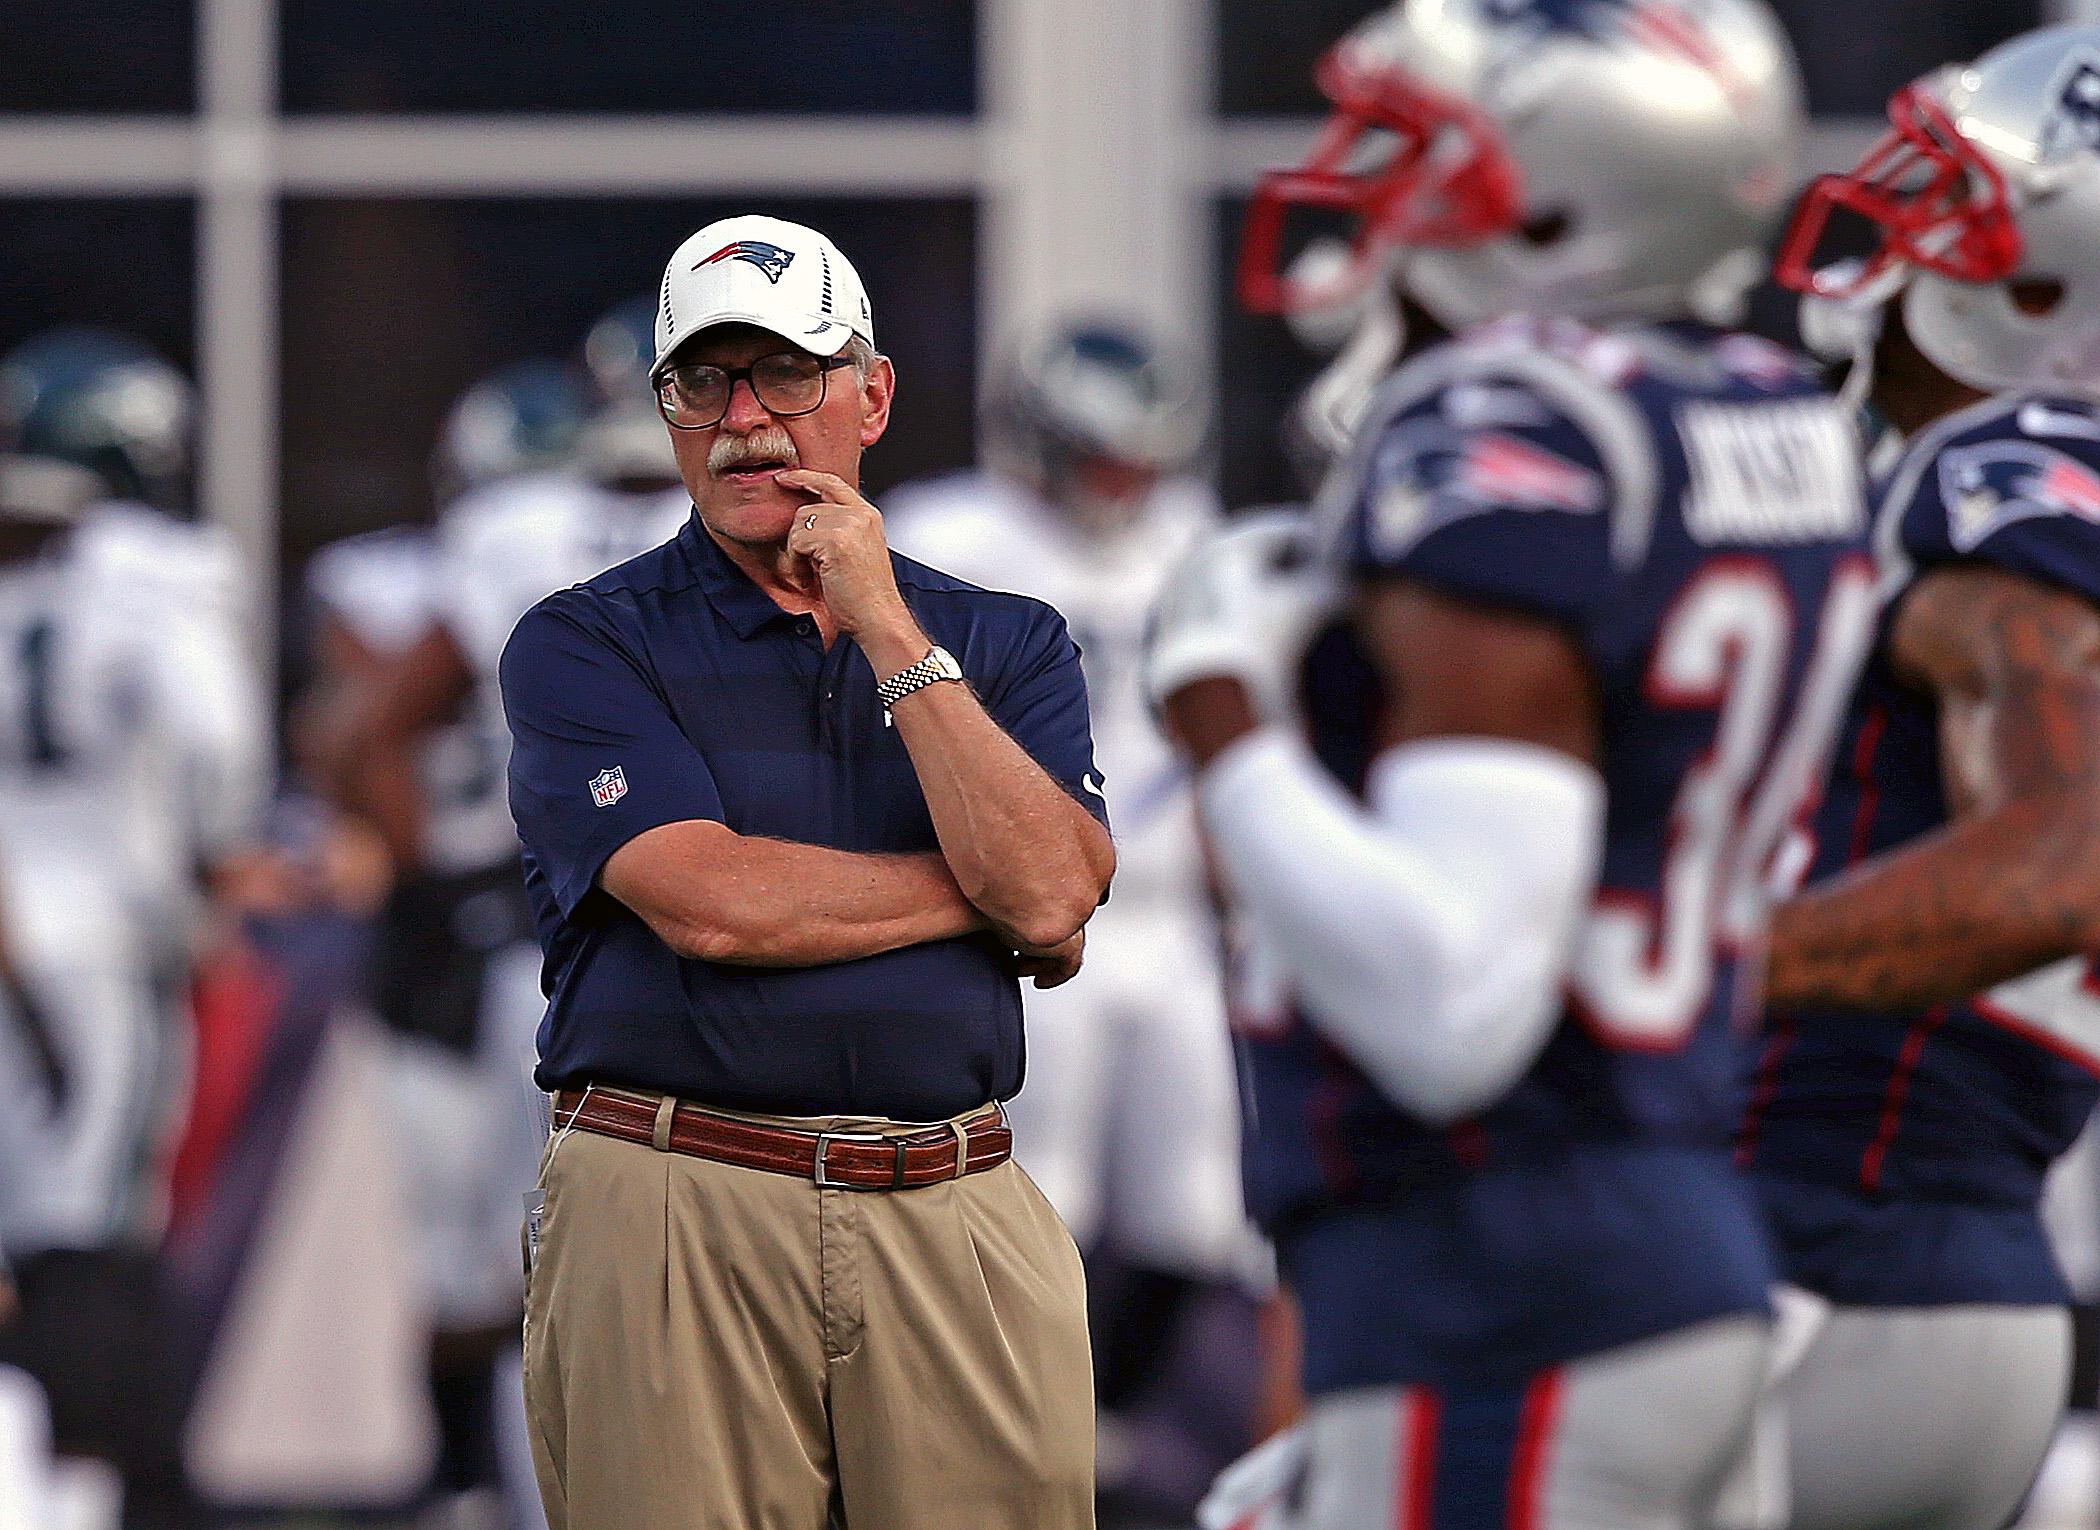 NFL Preseason: Philadelphia Eagles Vs New England Patriots At Gillette Stadium